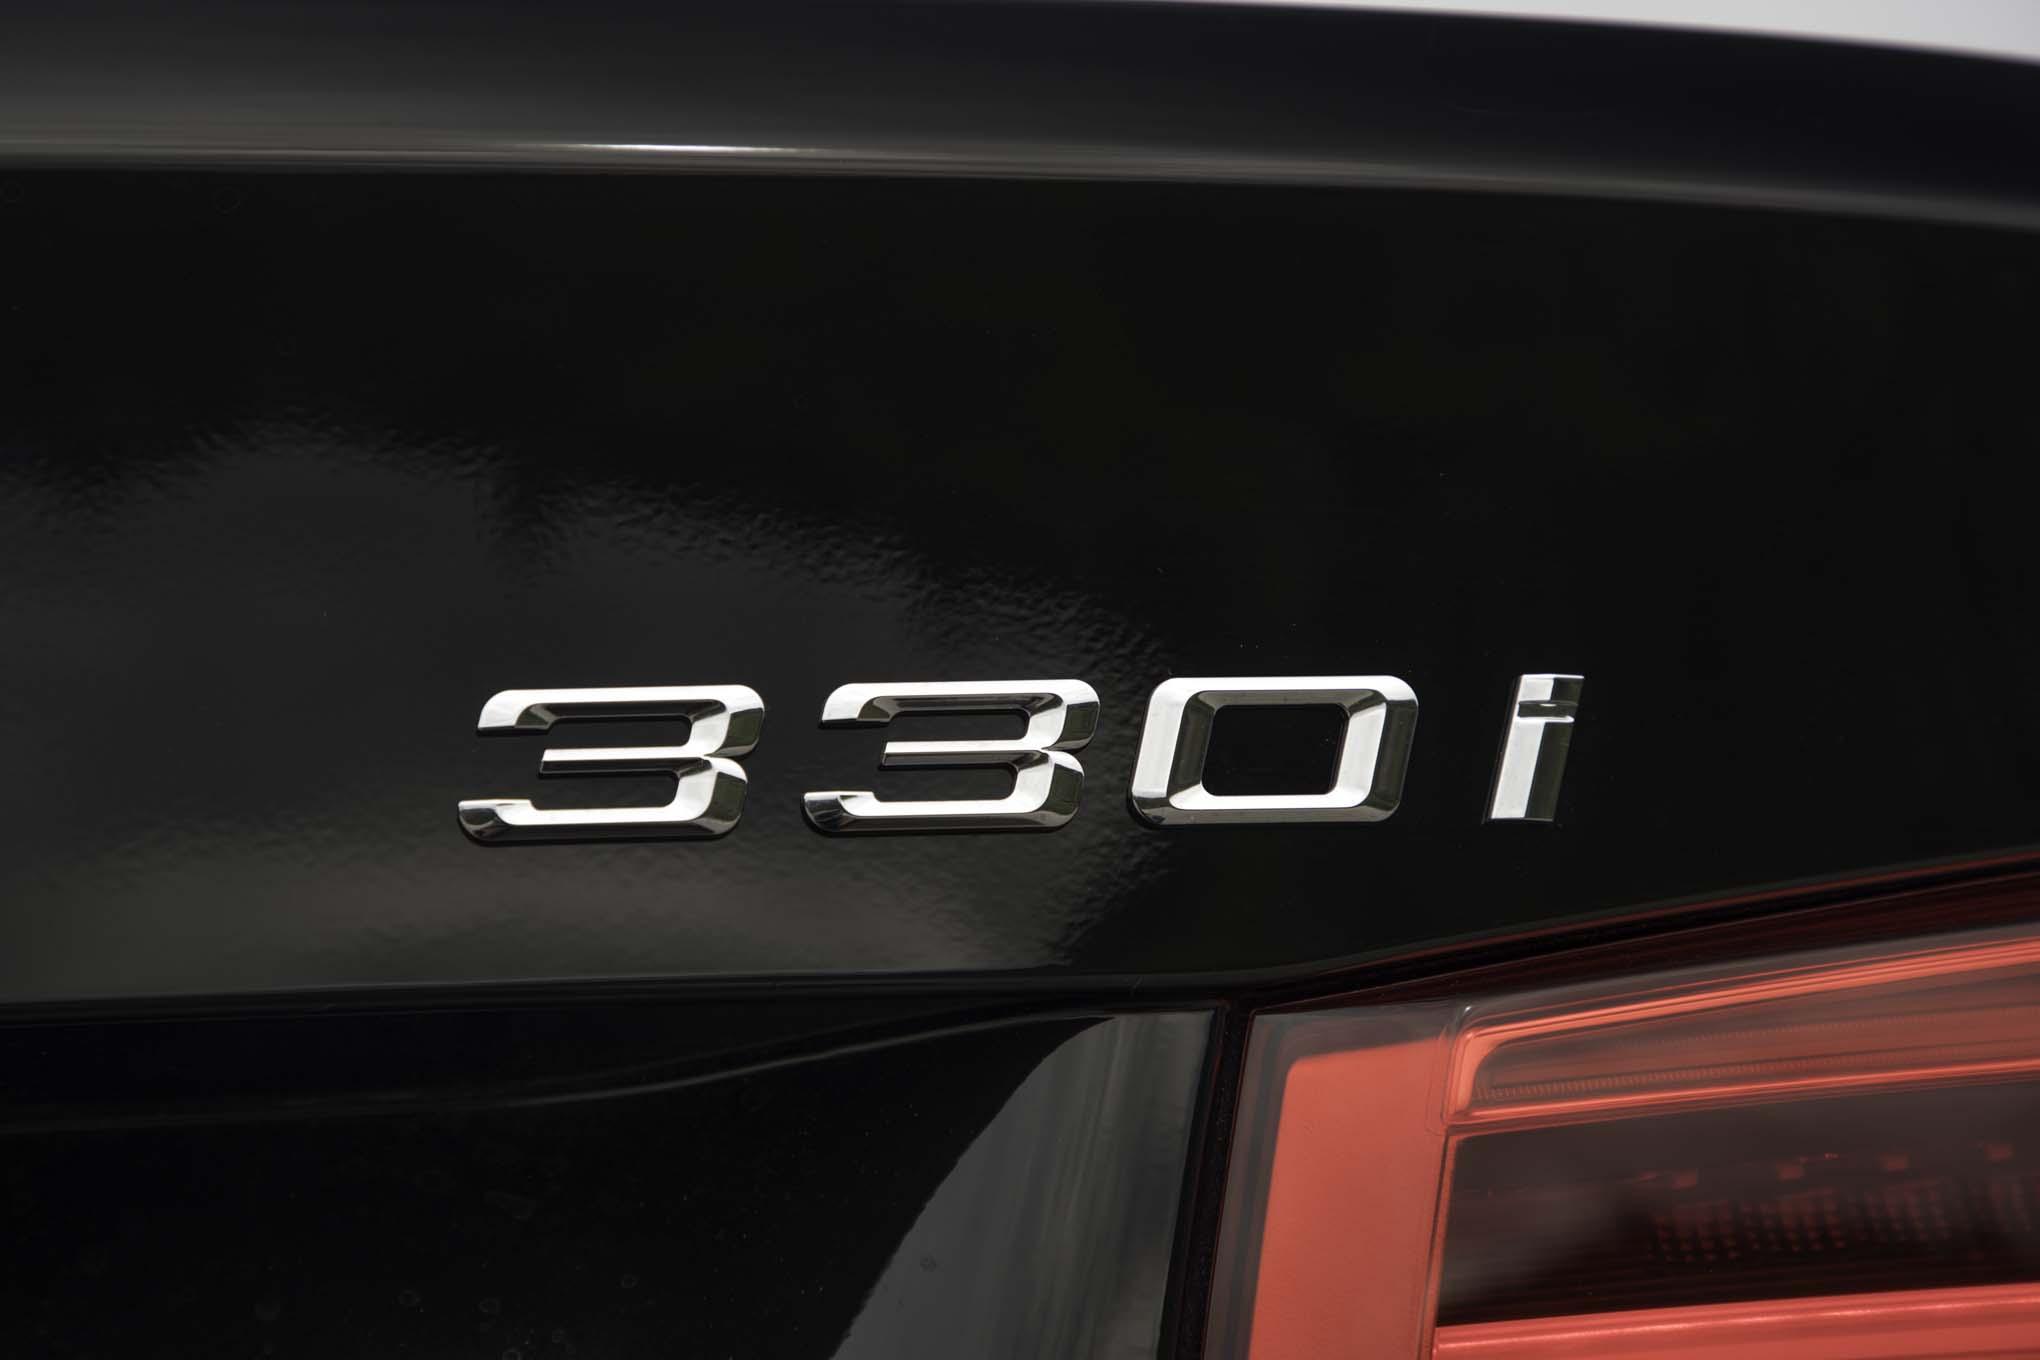 2017-BMW-330i-badge.jpg